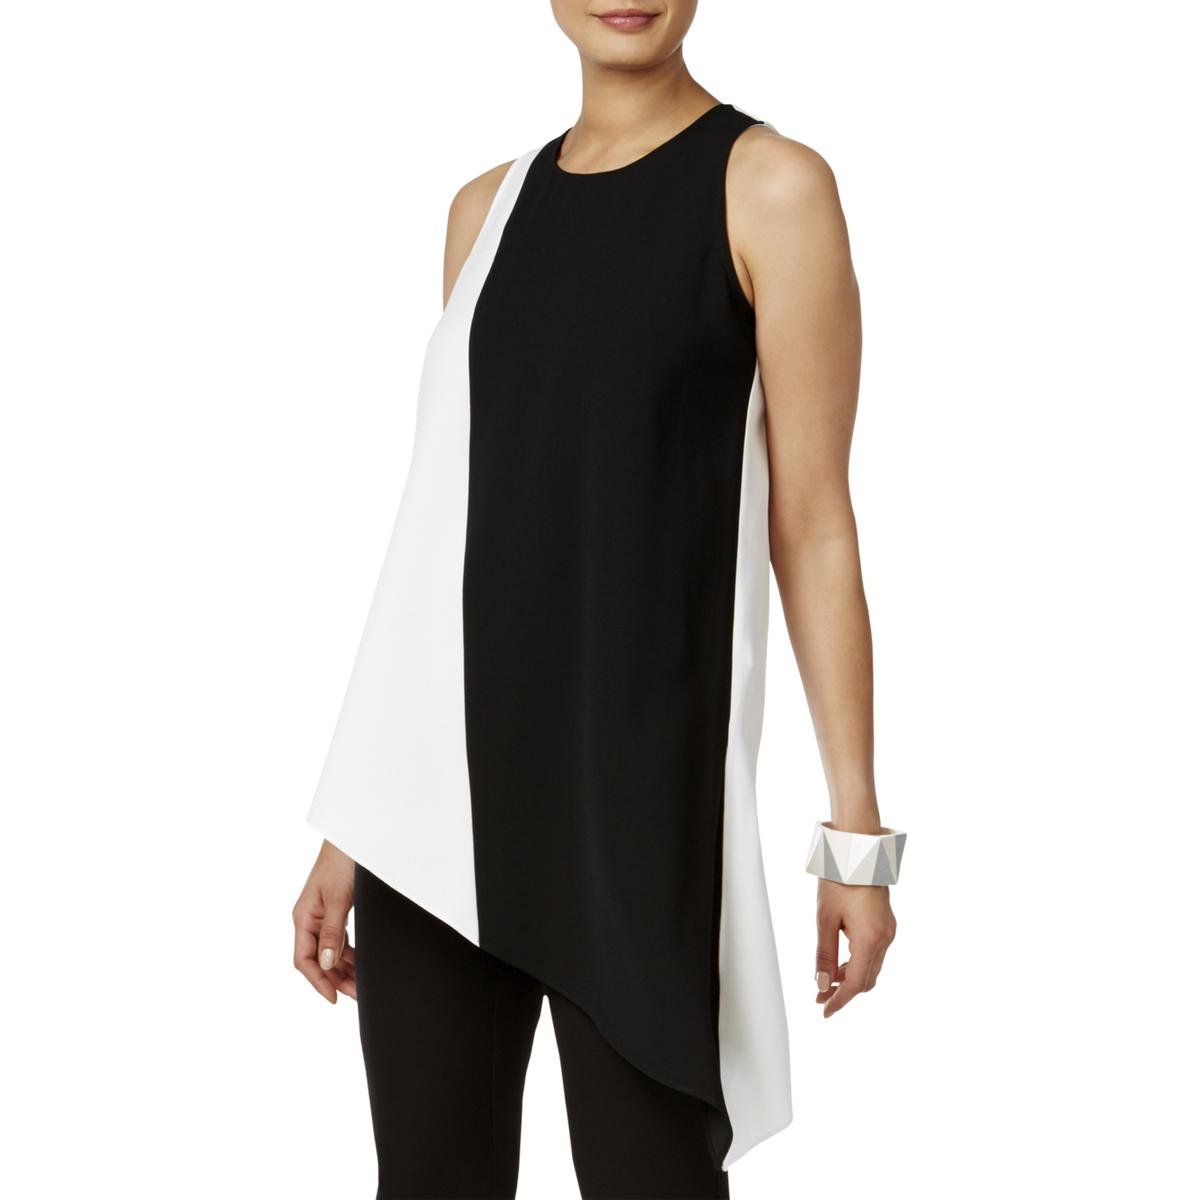 Alfani Womens Colorblock Asymmetrical Tunic Top B/W 6 by Alfani (Image #1)